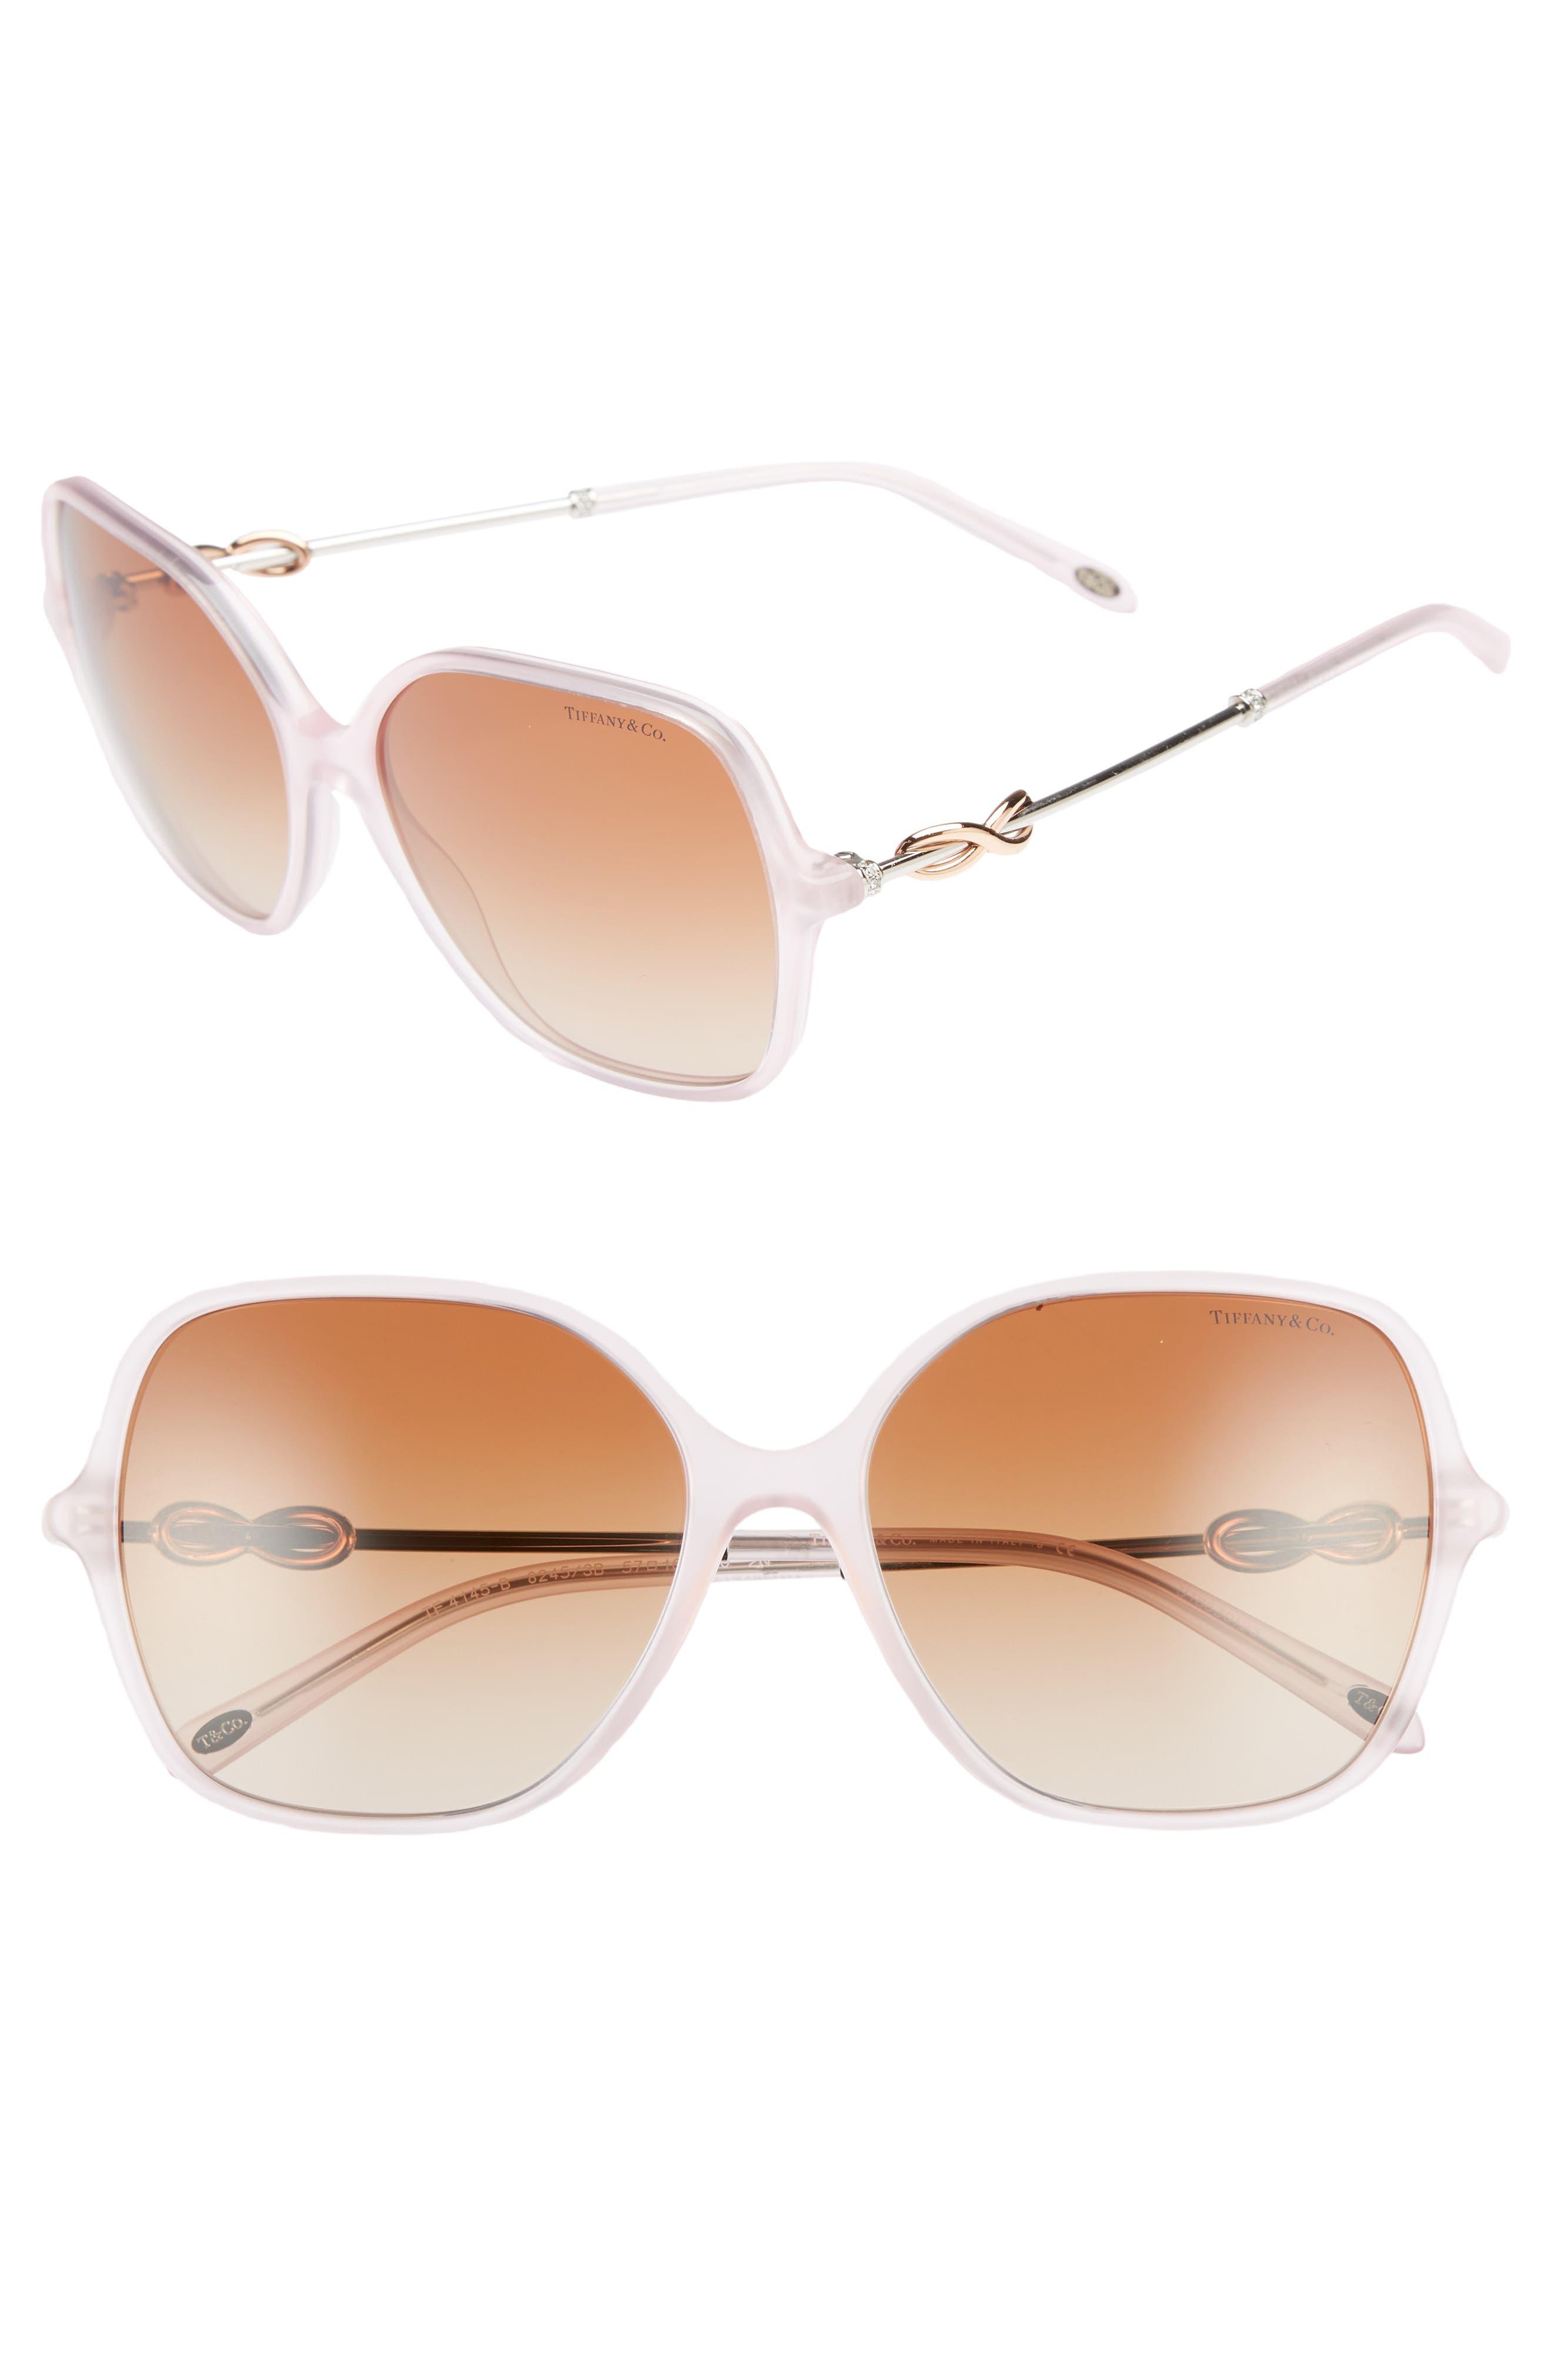 86422e057cc Women s Tiffany 57Mm Sunglasses - Rose Gradient